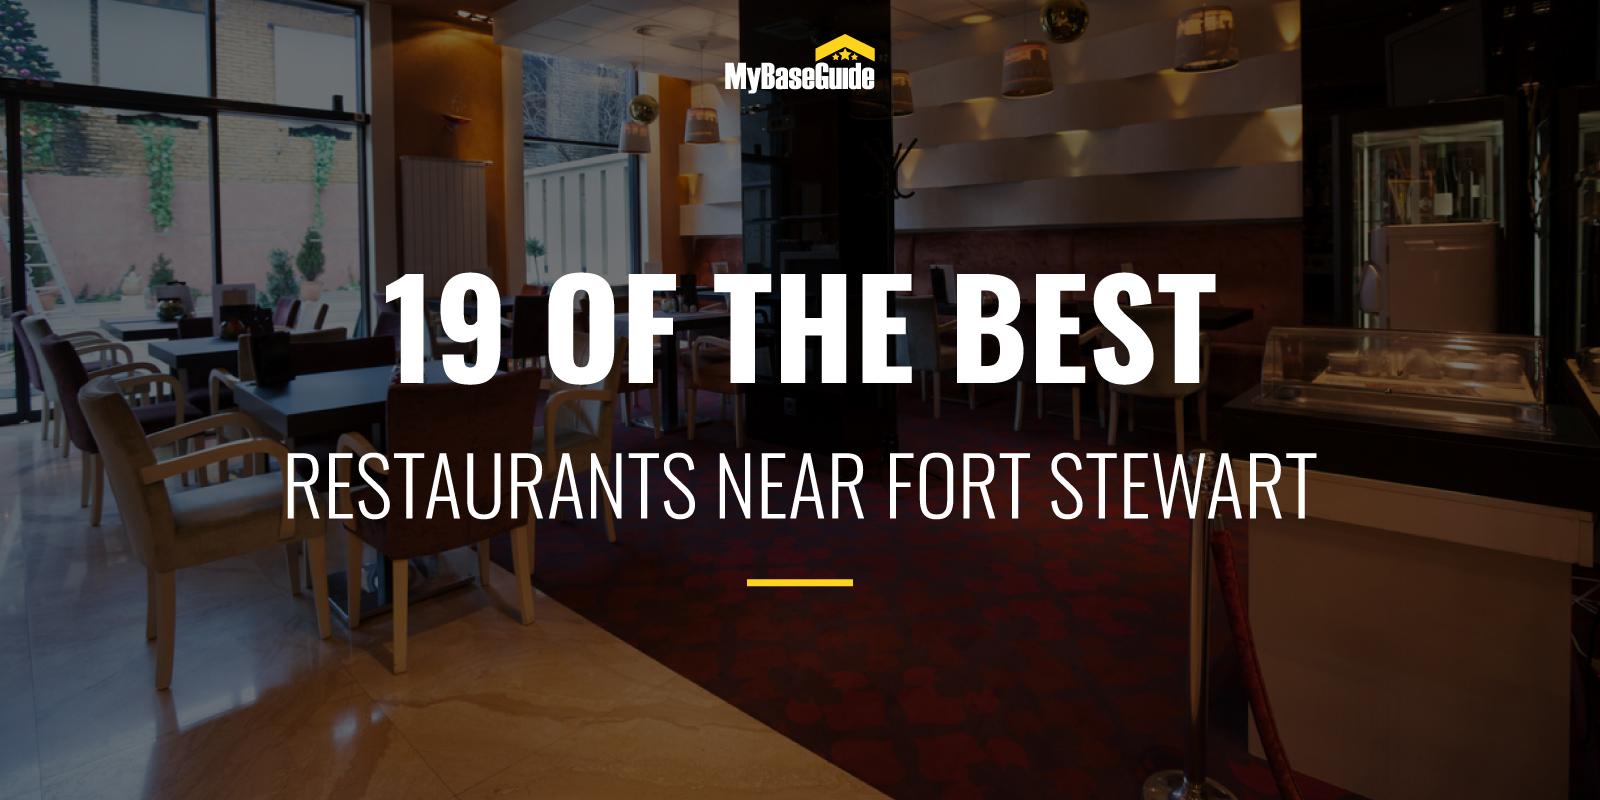 19 of the Best Restaurants Near Fort Stewart